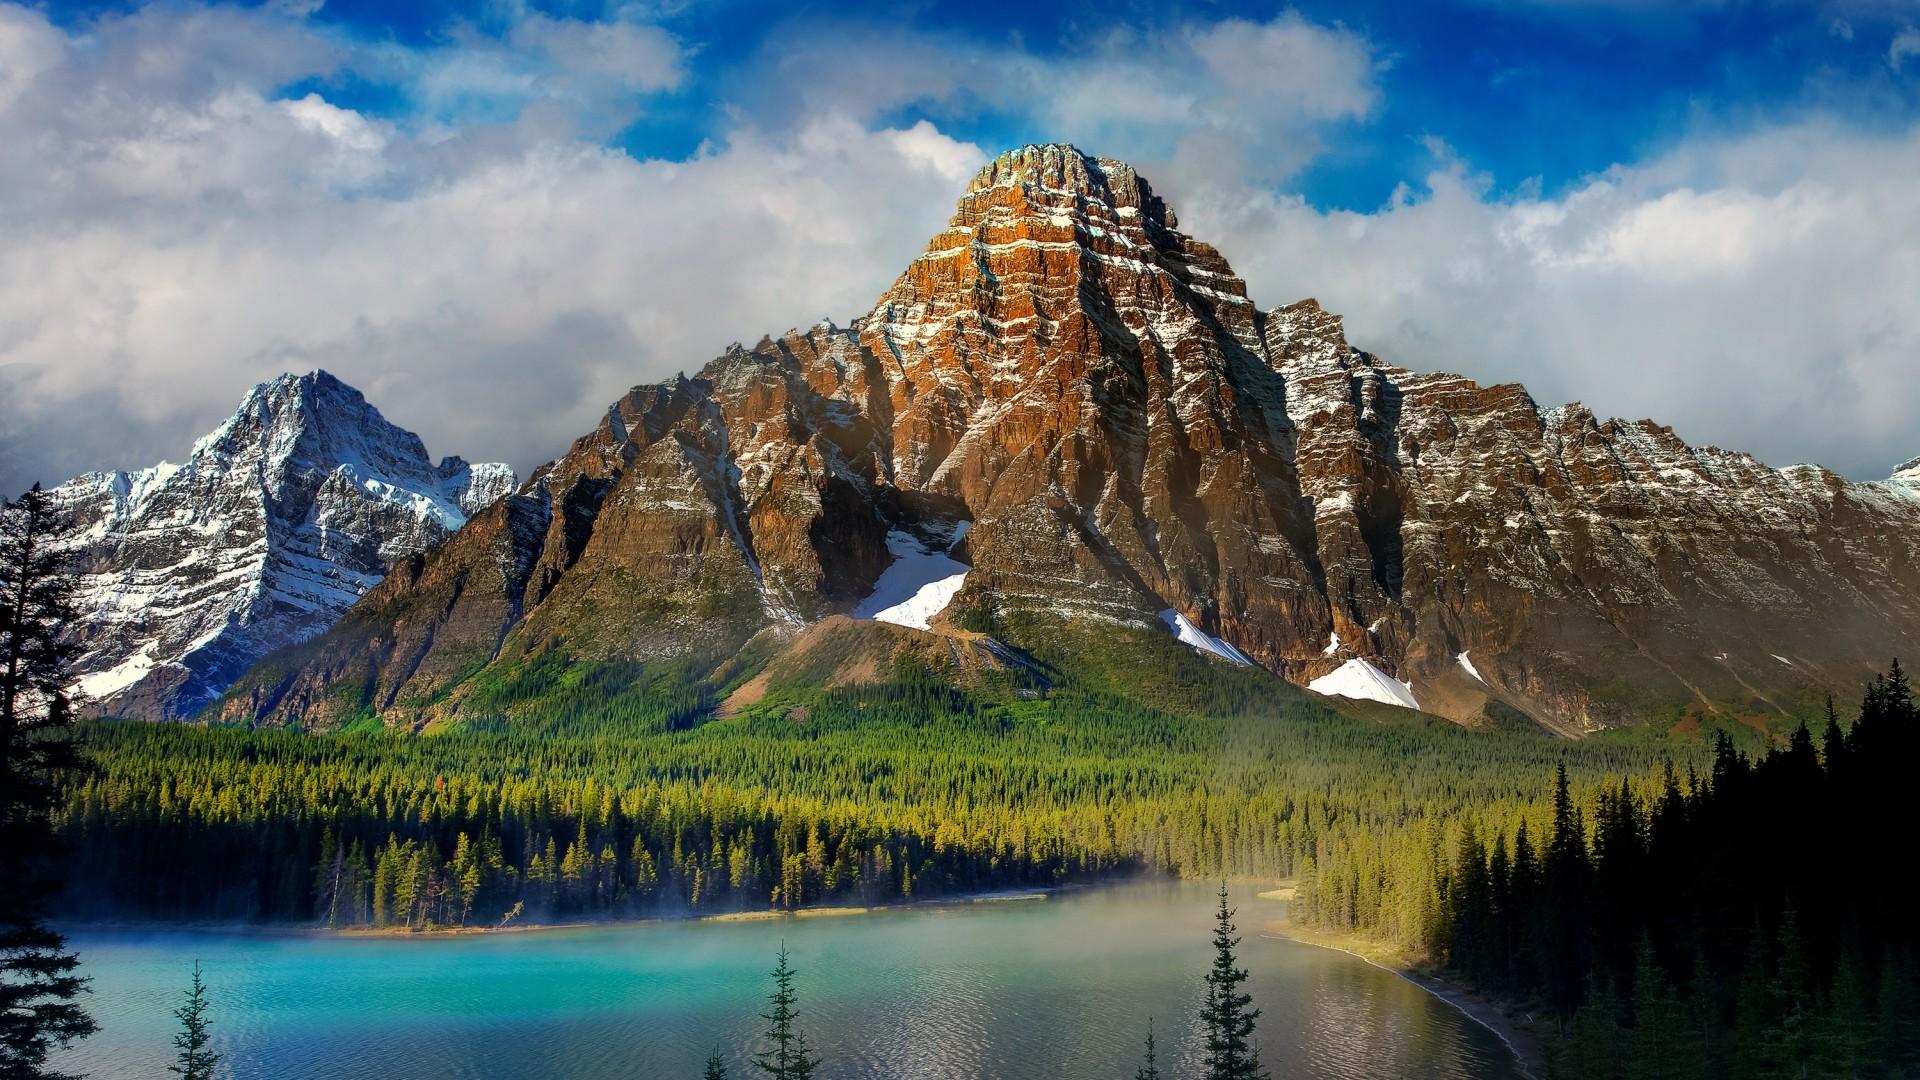 Preview wallpaper beautiful scenery, mountains, lake, nature 1920×1080